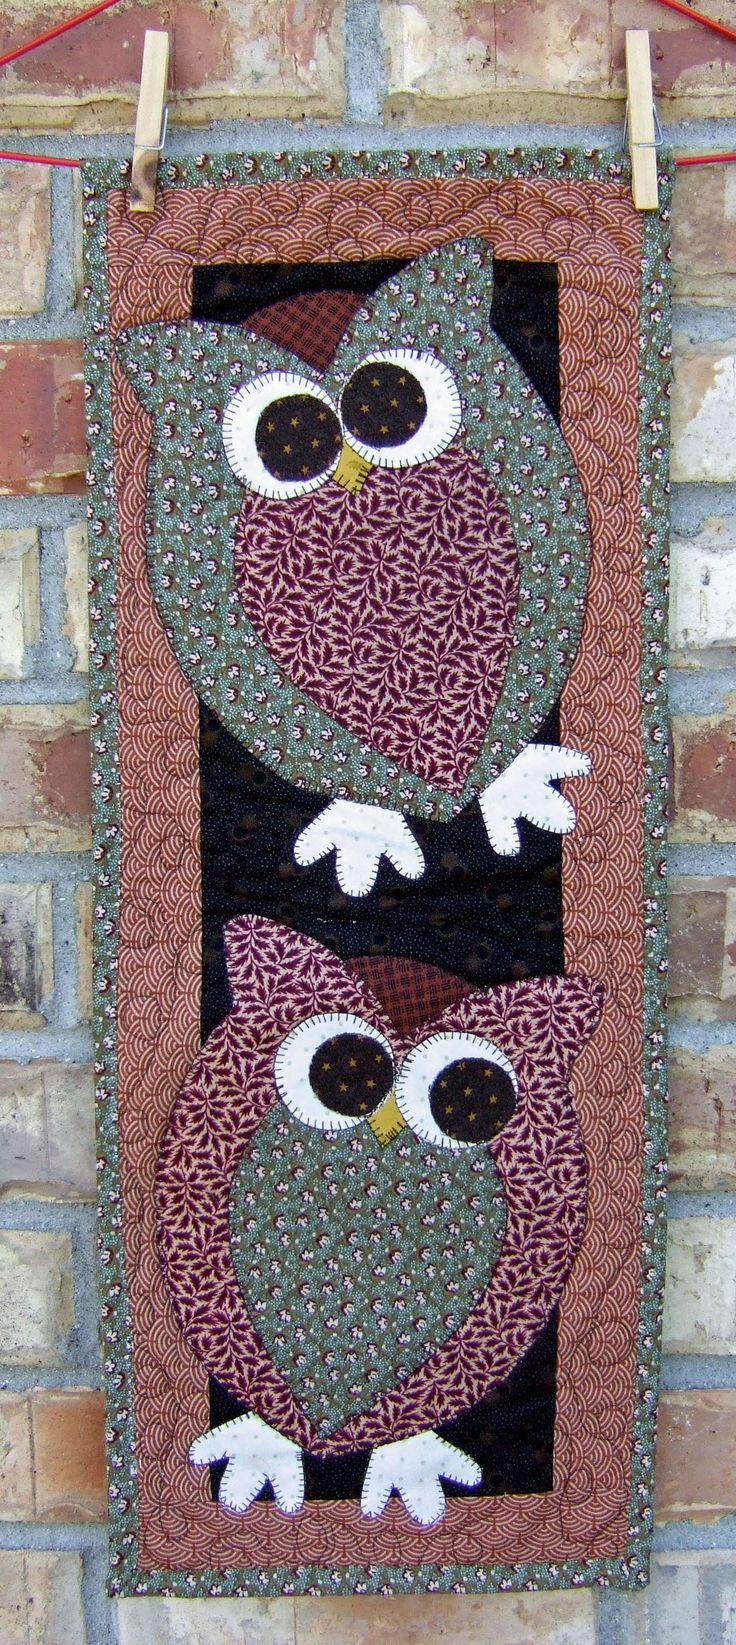 Image detail for -Quilt Pattern Design Skinnies: What a Hoot!   Quilt Pattern Design by ...